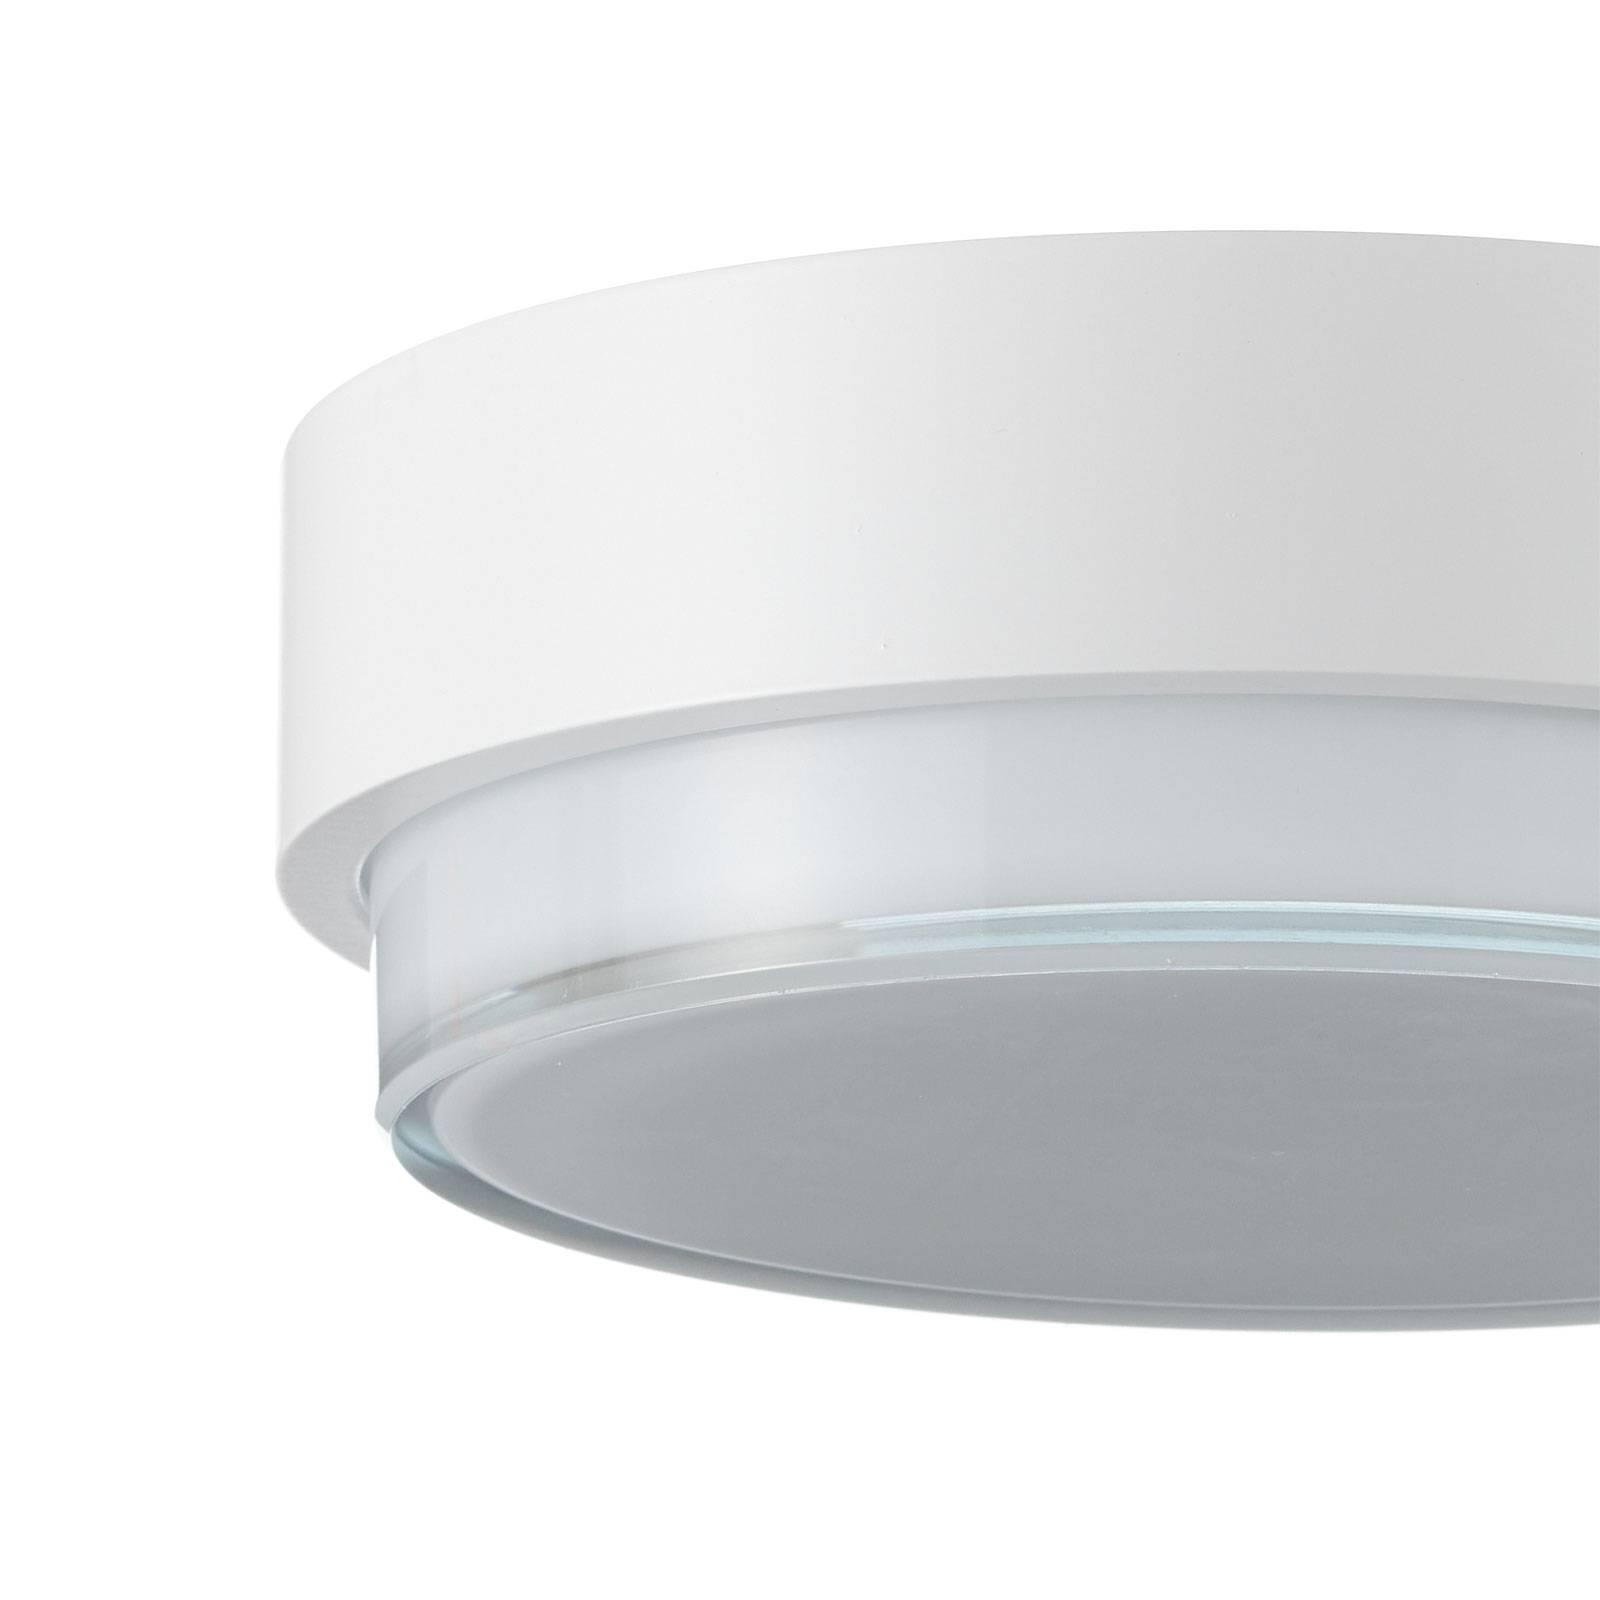 BEGA 50536 lampa sufitowa LED 930 biała Ø21cm